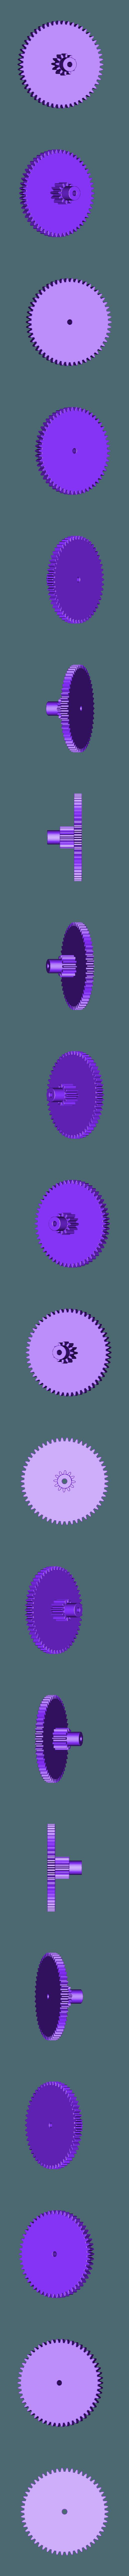 Spur_Gear_54_teeth_Stufe_2.stl Download free STL file wind-up Bathtub Boat V4 - Badewannen Boot zum Aufziehen - Funktionsfähig • Model to 3D print, GreenDot